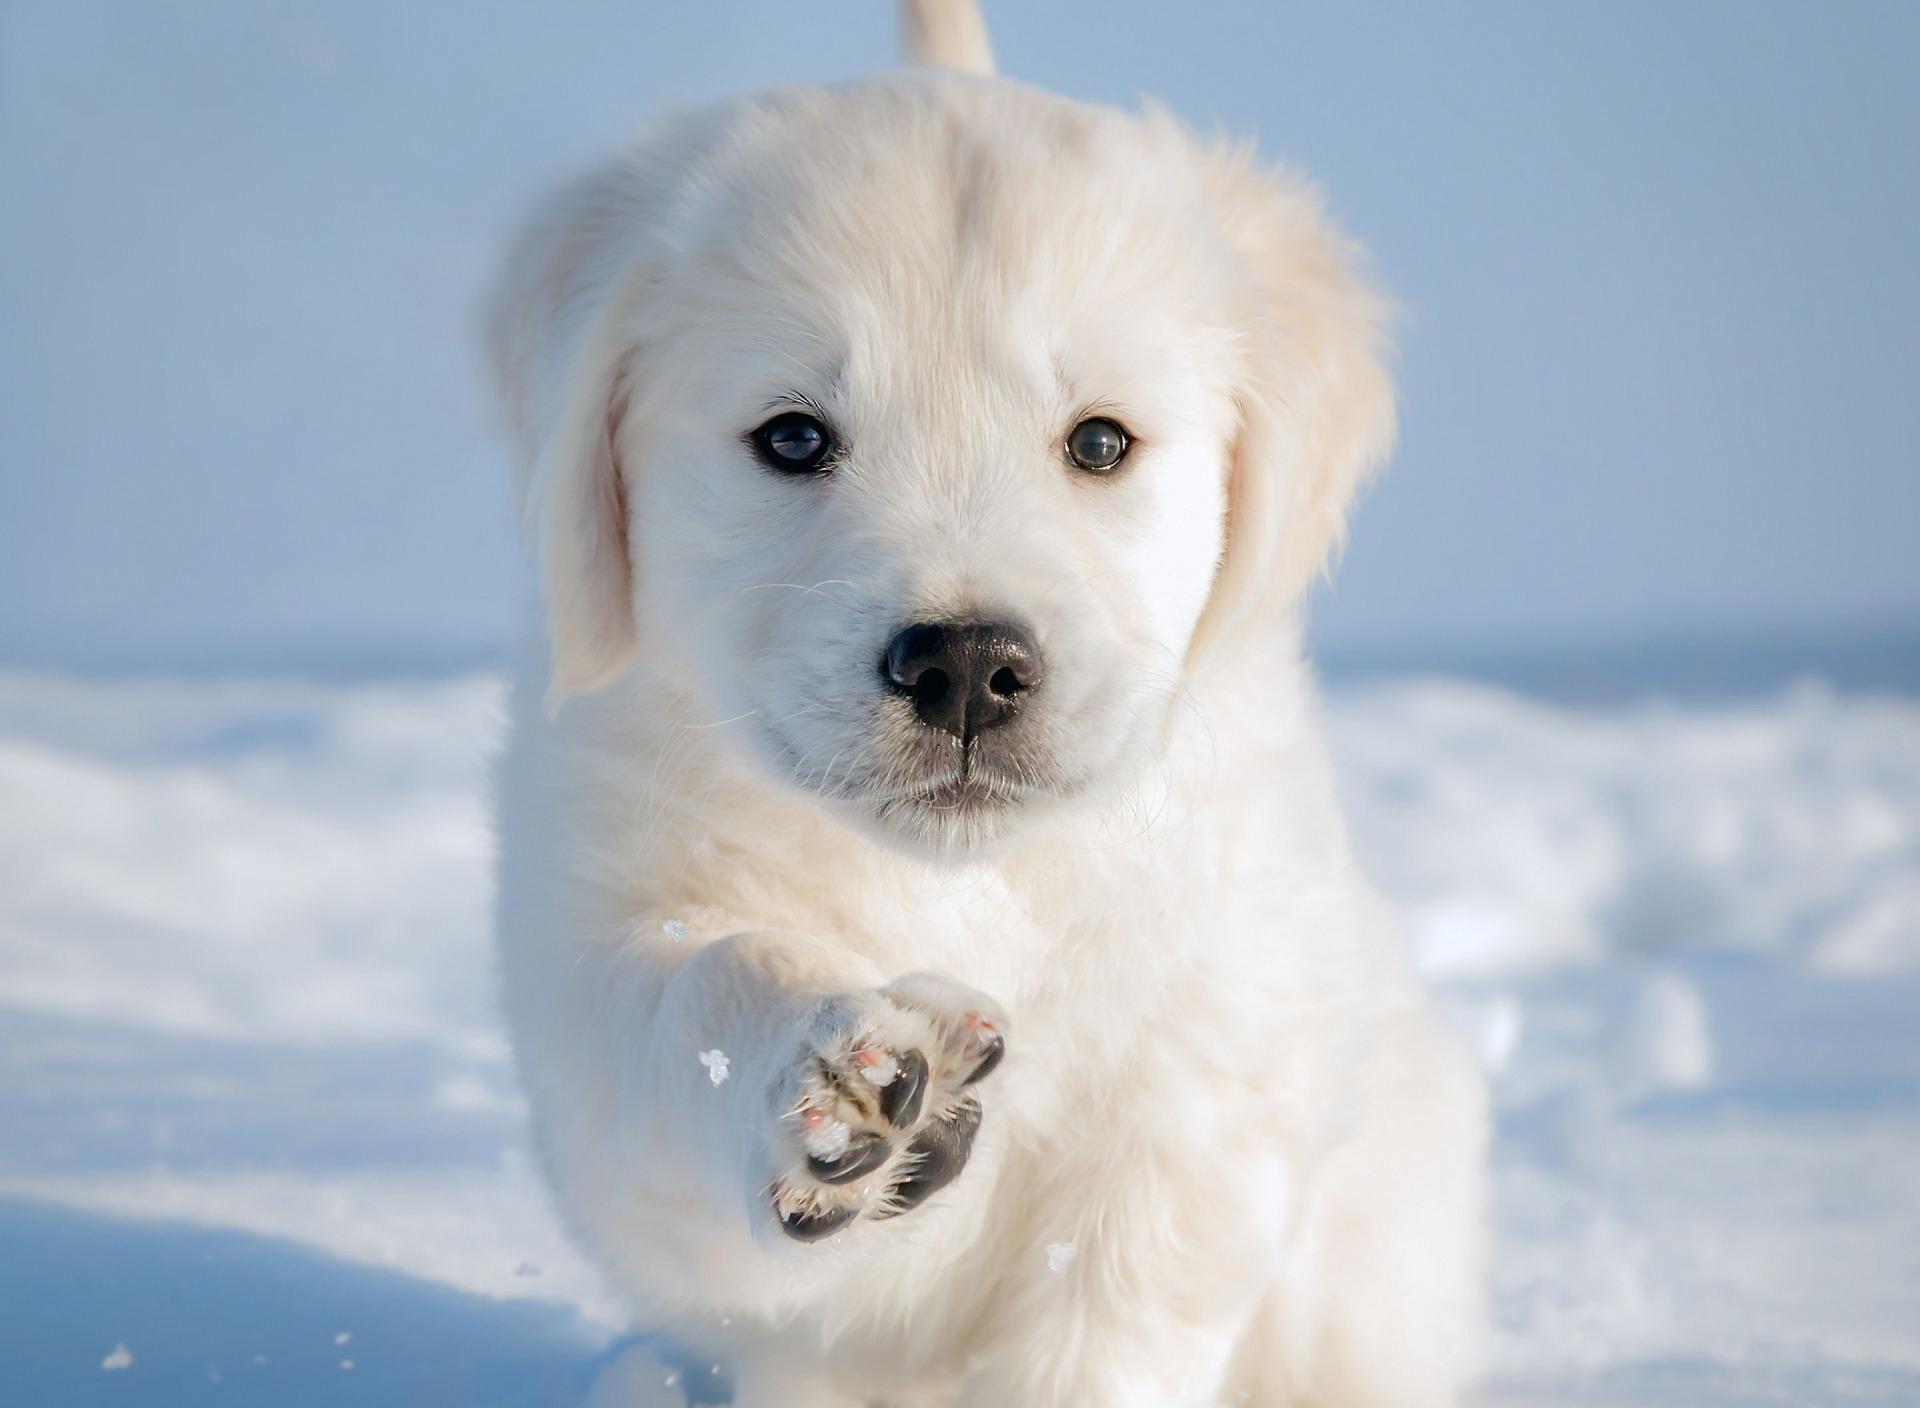 щенок снег puppy snow  № 2001750 загрузить